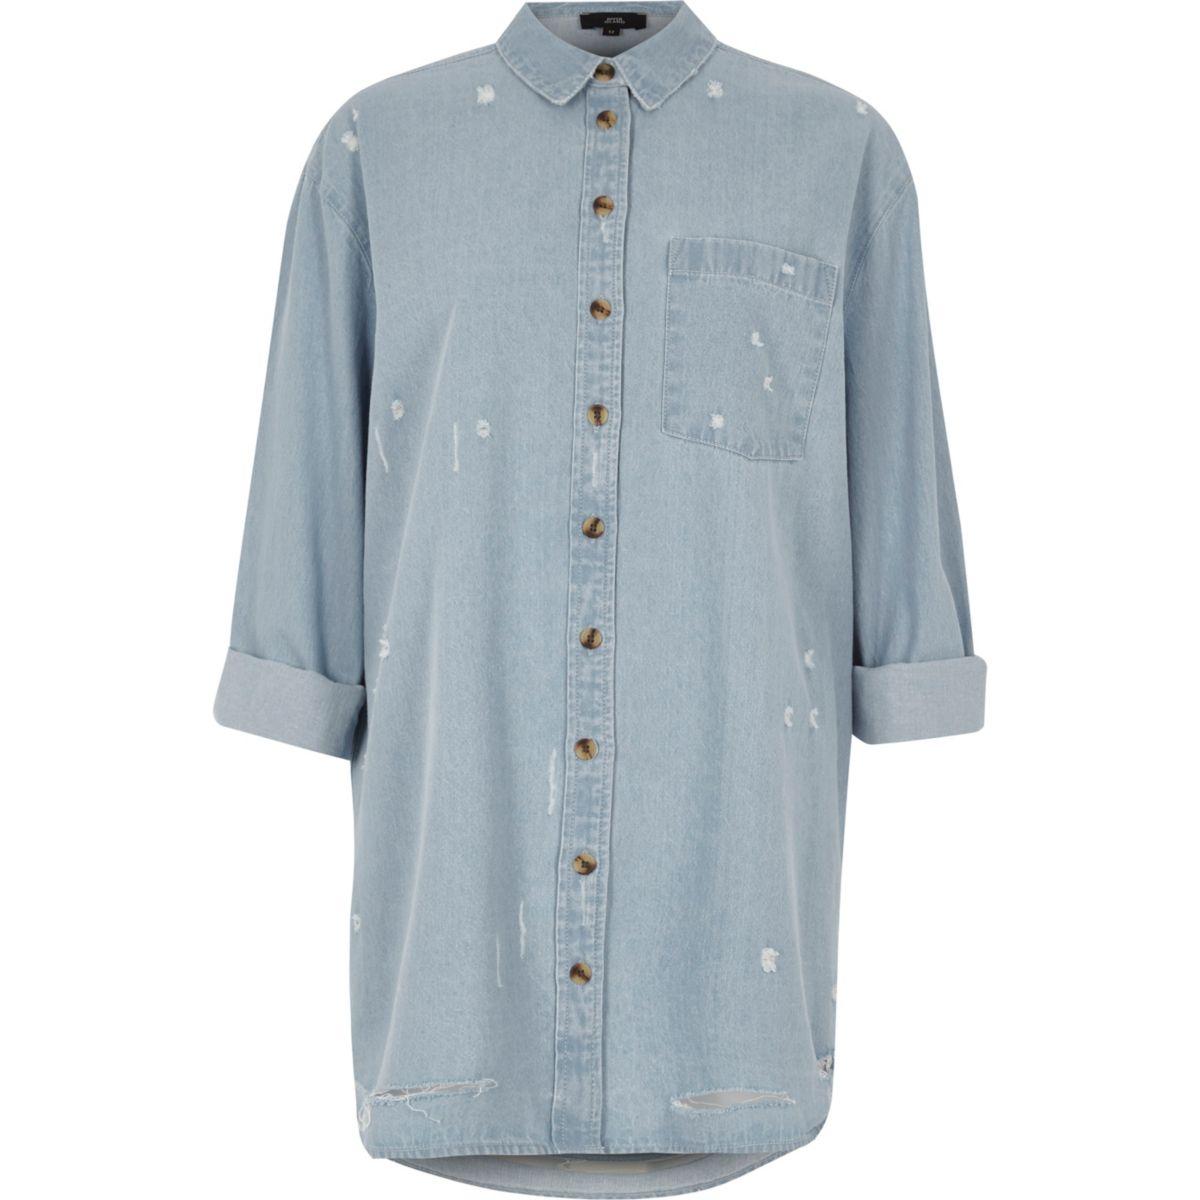 Light blue oversized distressed denim shirt